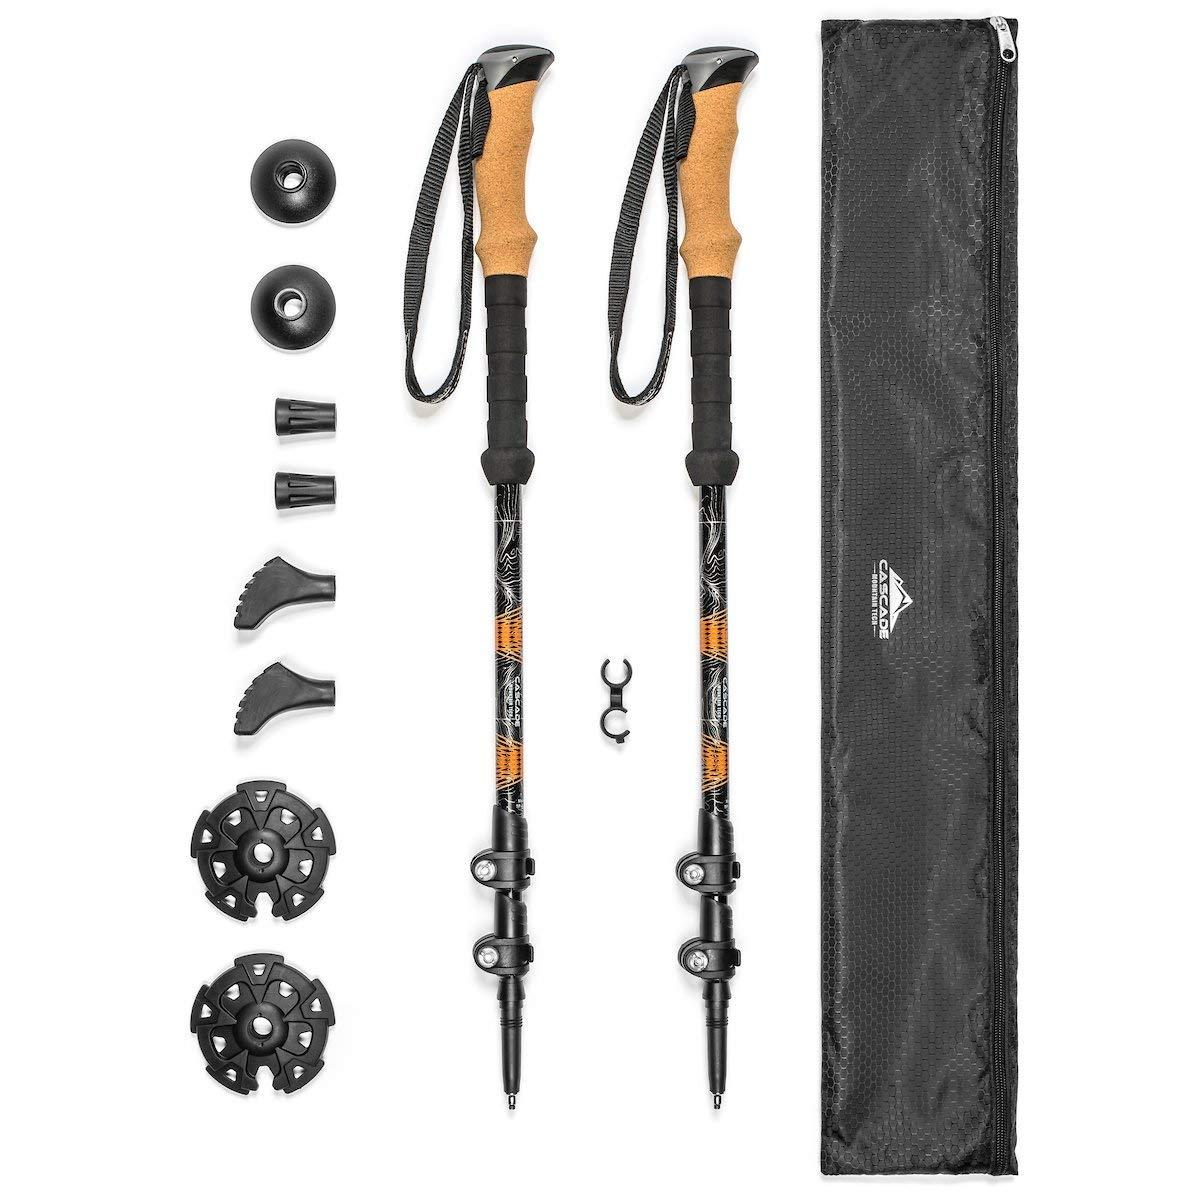 Cascade Mountain Tech Aluminum Quick Lock Trekking Poles - Collapsible Walking or Hiking Stick